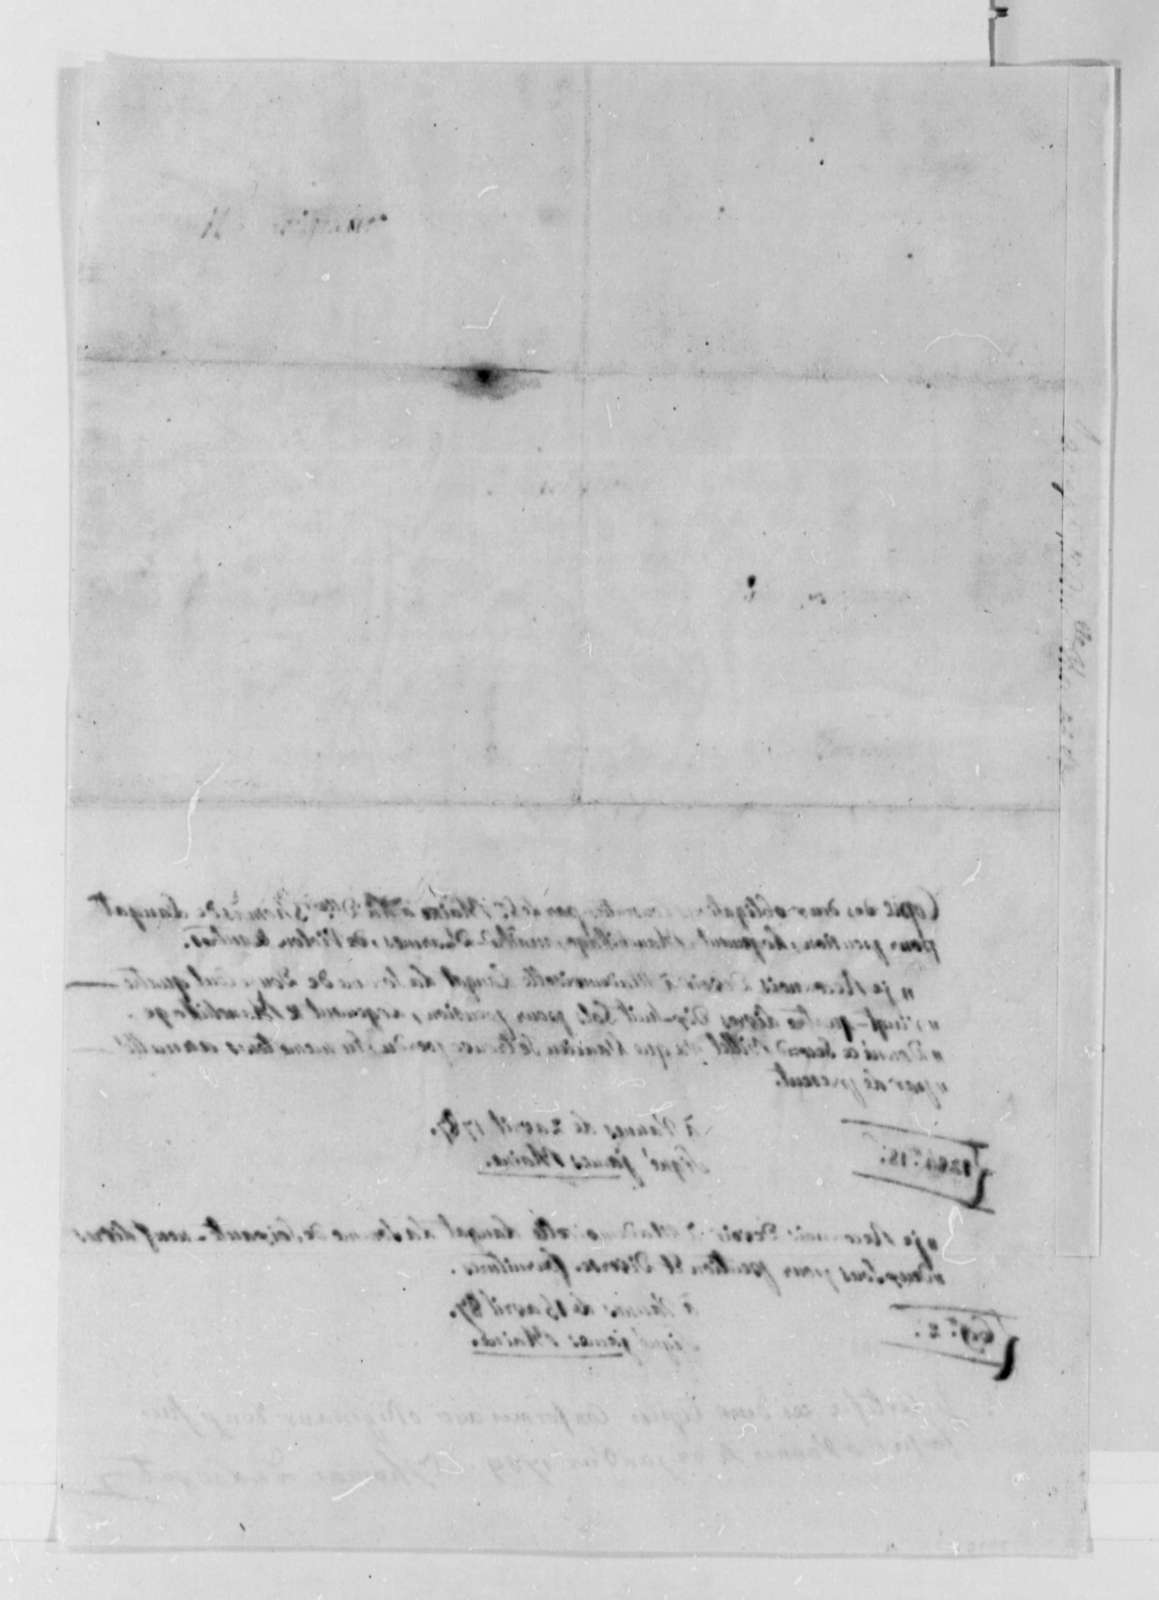 Thomas de Langat to Thomas Jefferson, January 22, 1789